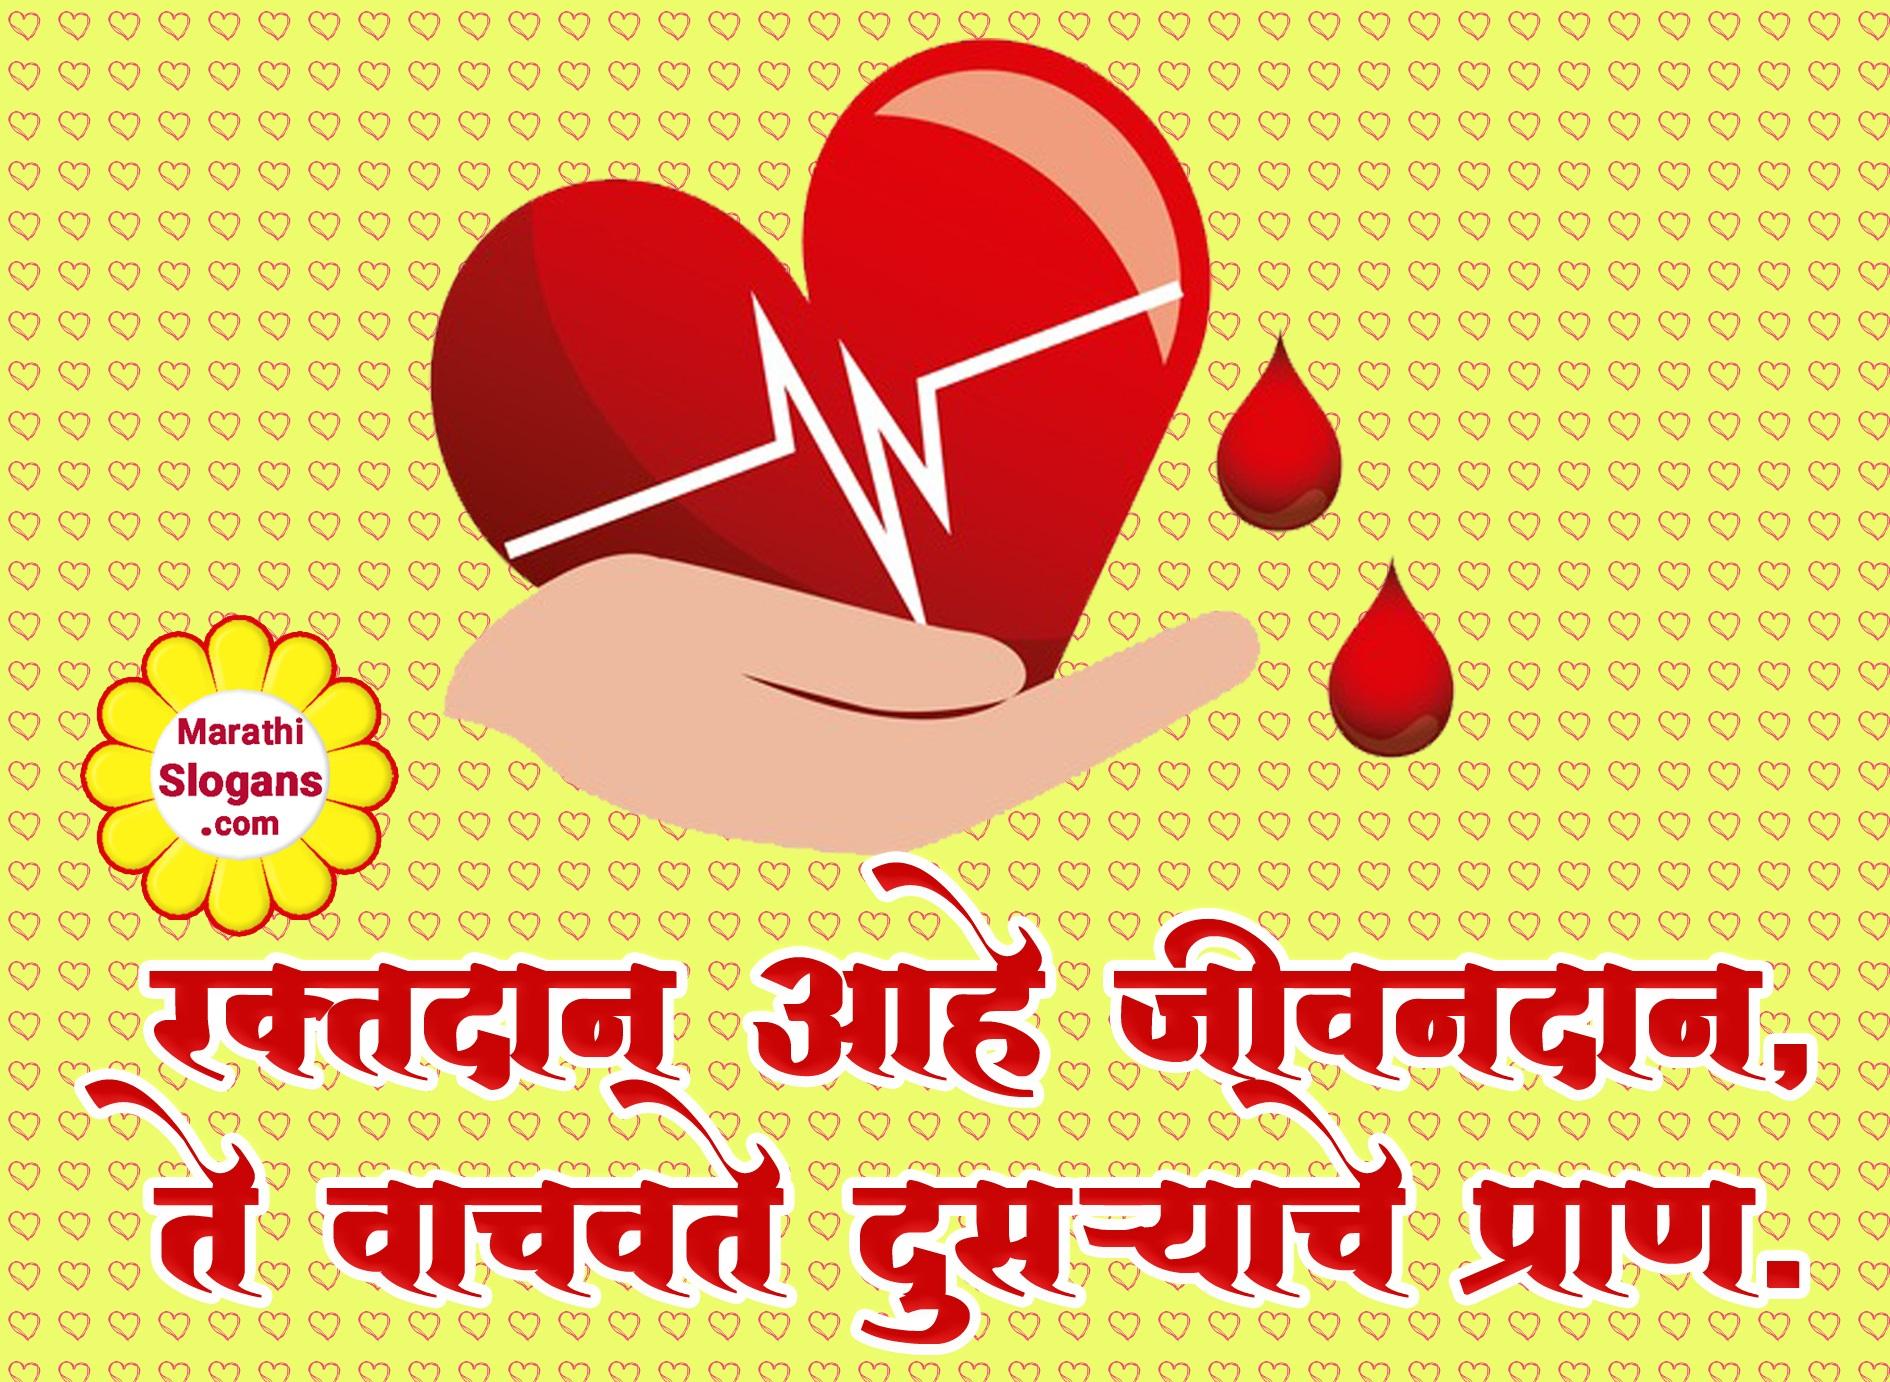 Blood Donation Slogans (रक्तदान घोषवाक्य) in